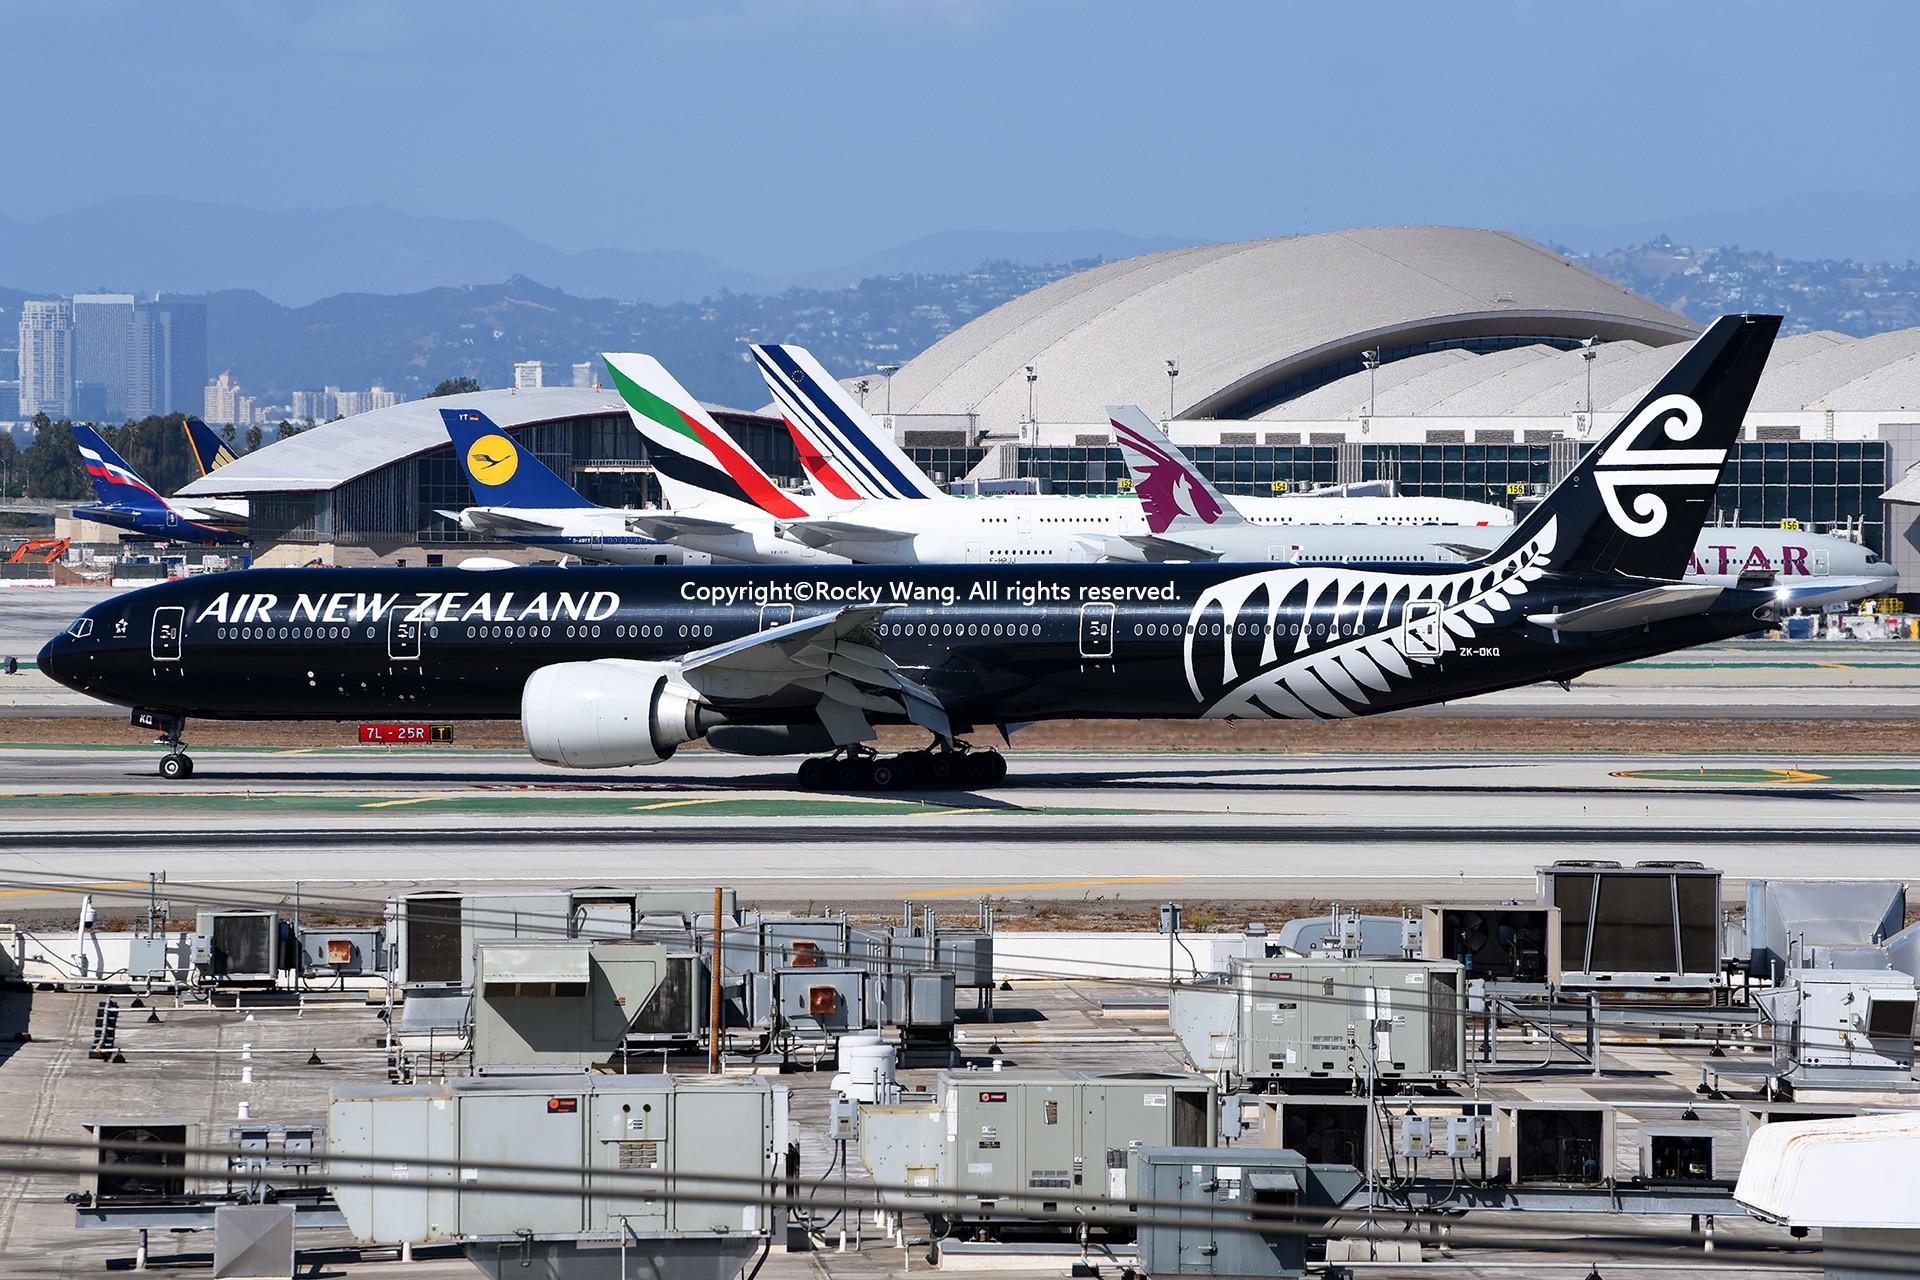 Re:[原创]彩绘圣地-附加彩蛋 BOEING 777-319ER ZK-OKQ Los Angeles Int'l Airport